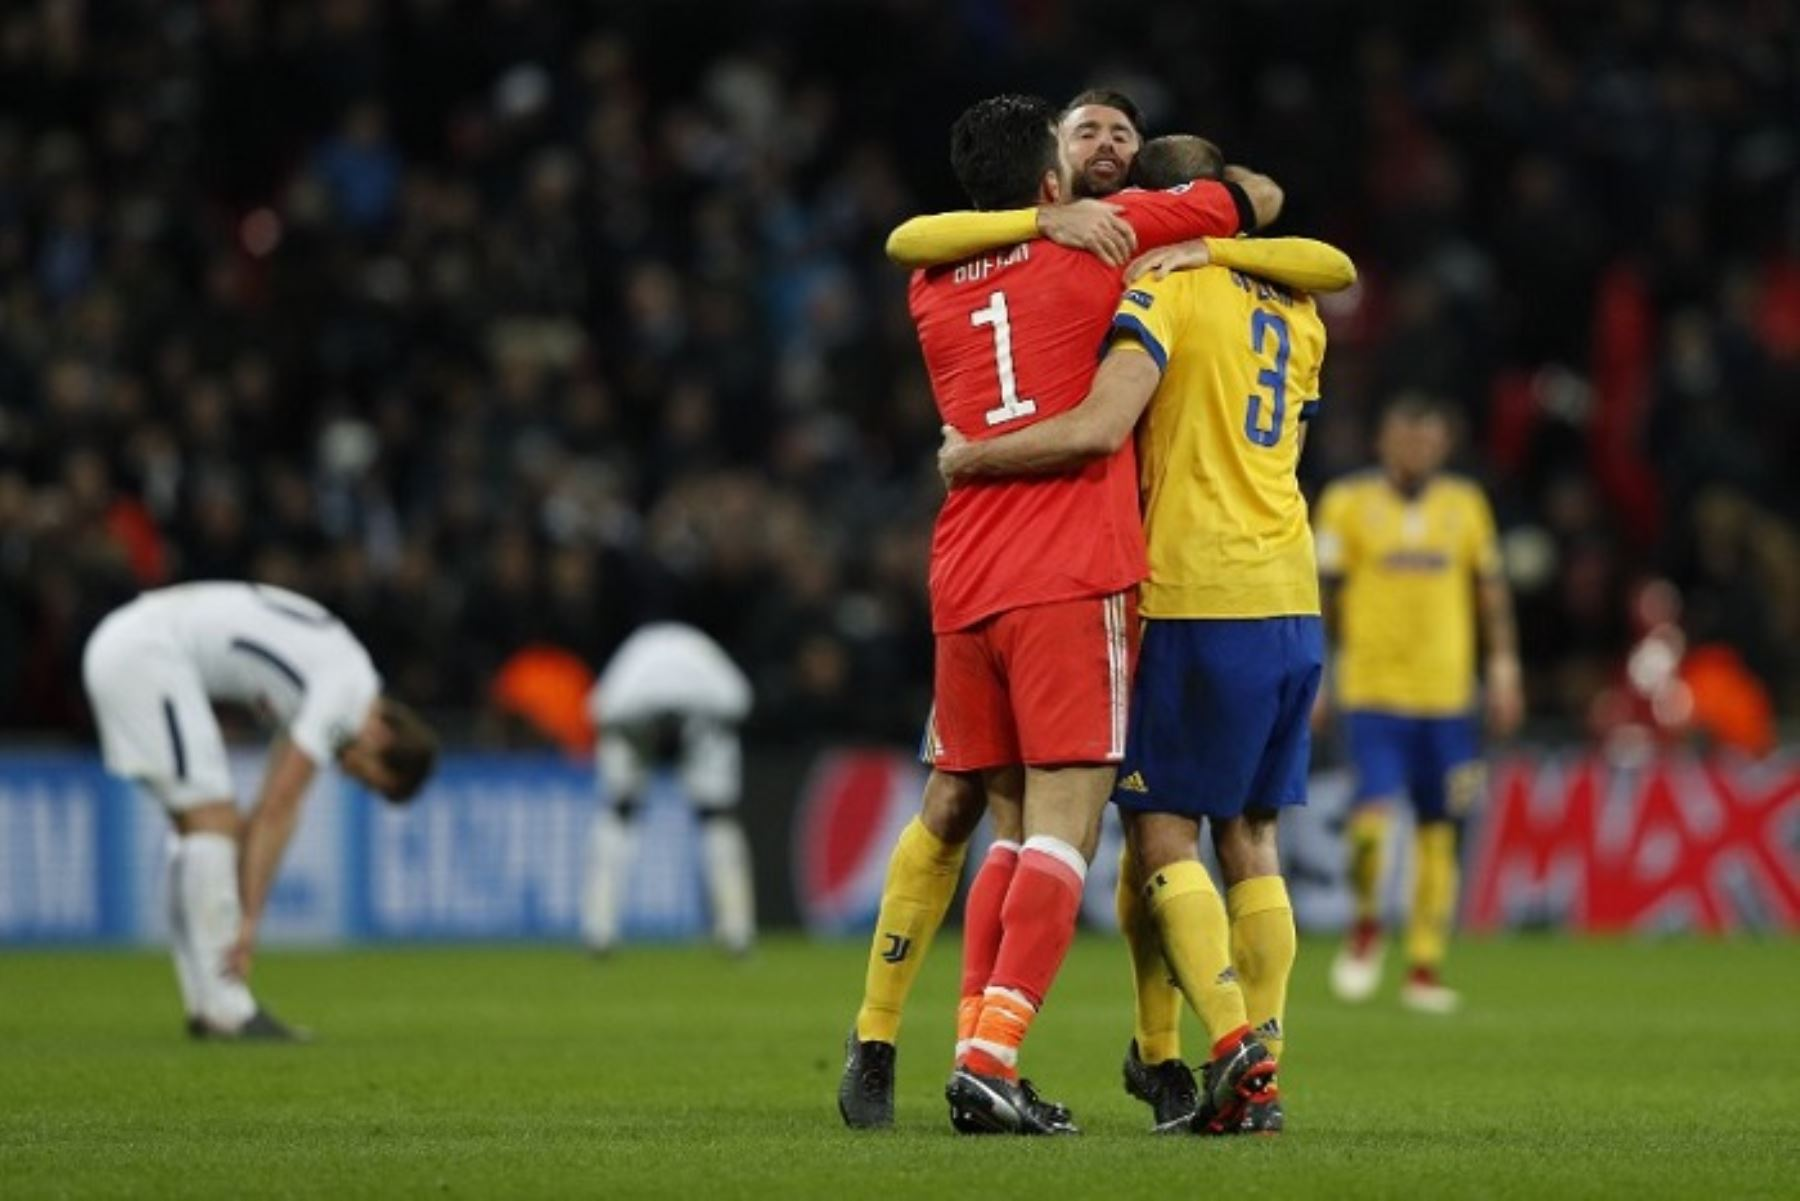 Juventus superó al Totenham, que no pudo mantener su triunfo parcial